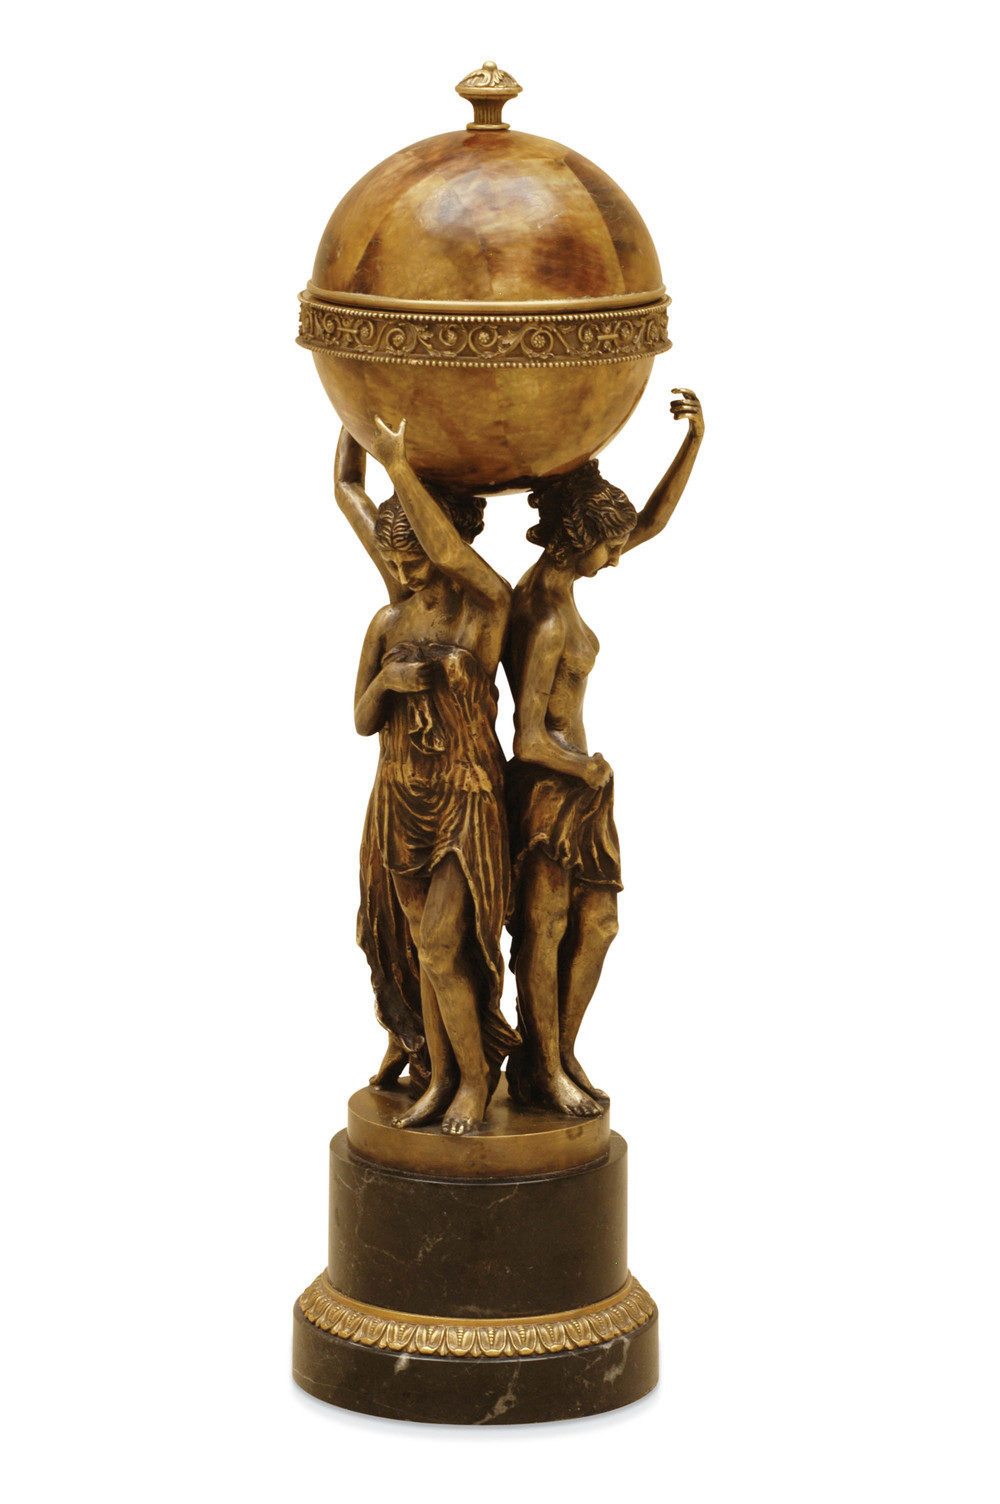 Maitland-Smith - Highlighted Brass Ladies Holding Tiger Penshell Box